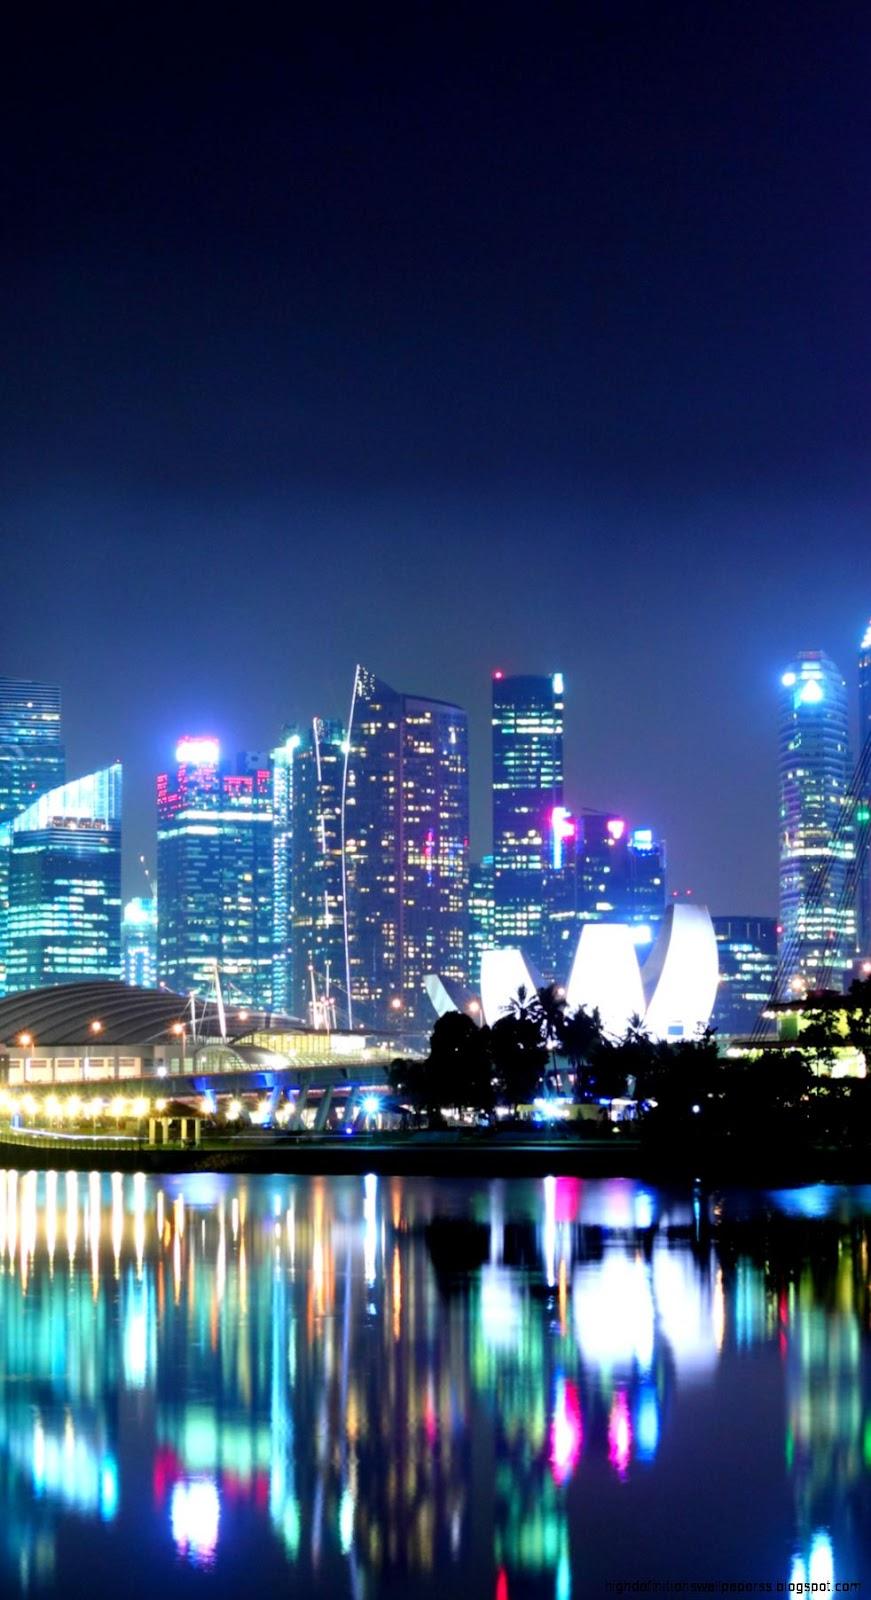 Skyline Singapore City At Night Hd Wallpaper